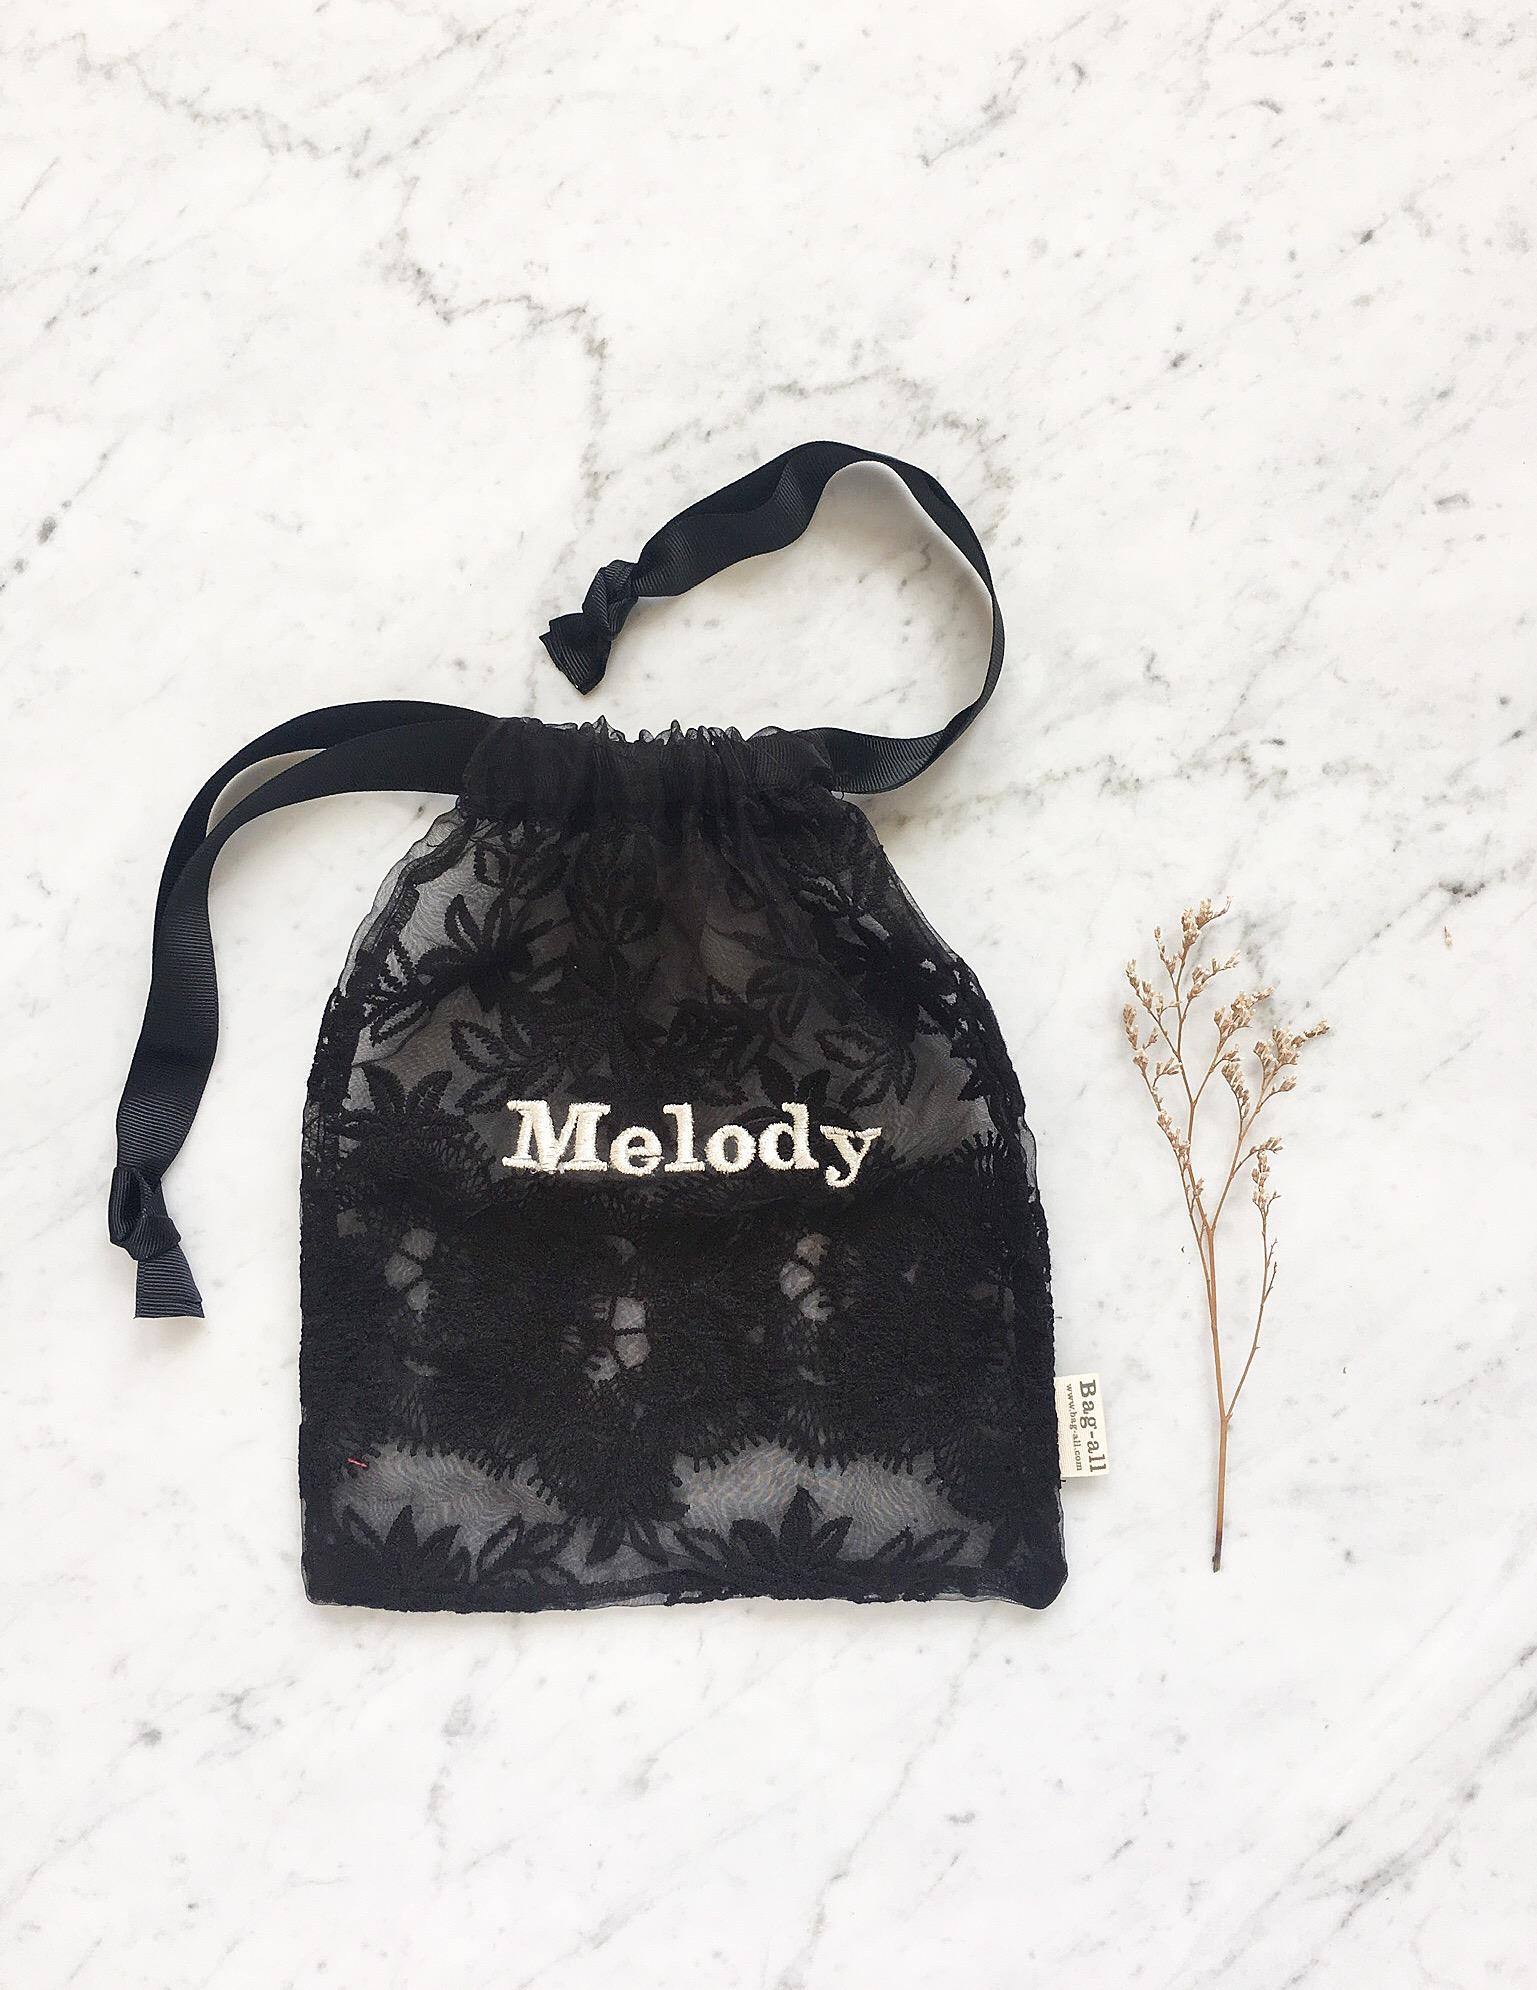 black lace bag monogram, mood bag-all 2.JPG